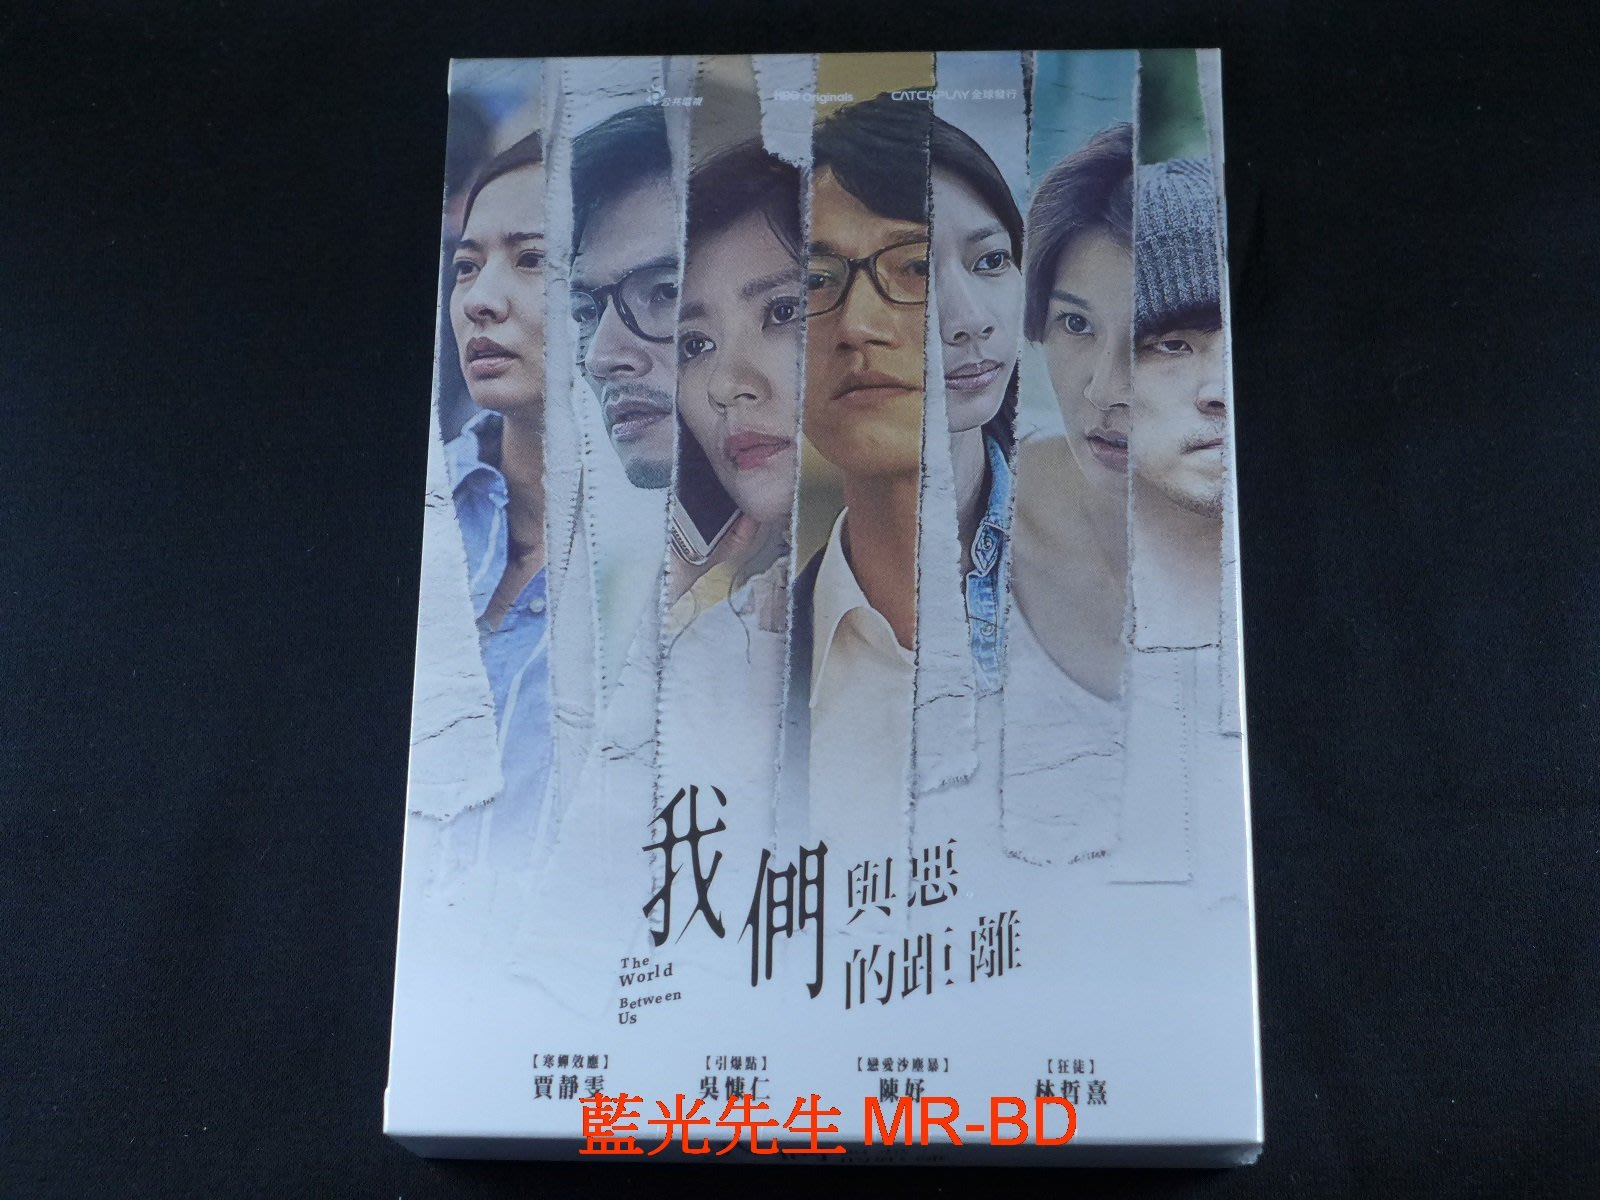 [DVD] - 我們與惡的距離 The World Between Us 四碟版 ( 采昌正版 )